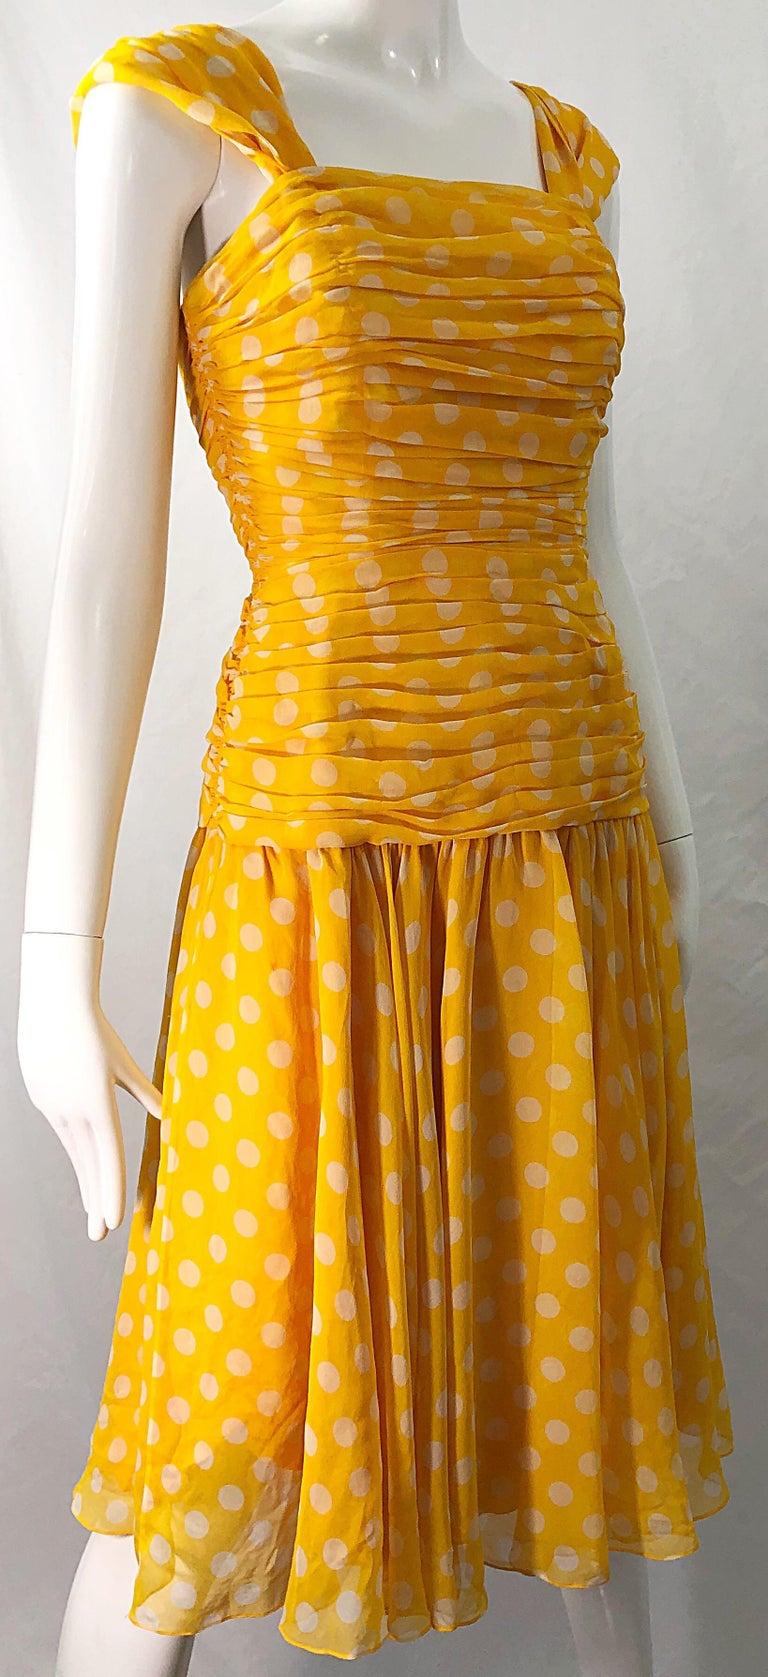 Adele Simpson 1980s Size 4 Yellow White Silk Chiffon Polka Dot Vintage 80s Dress For Sale 2